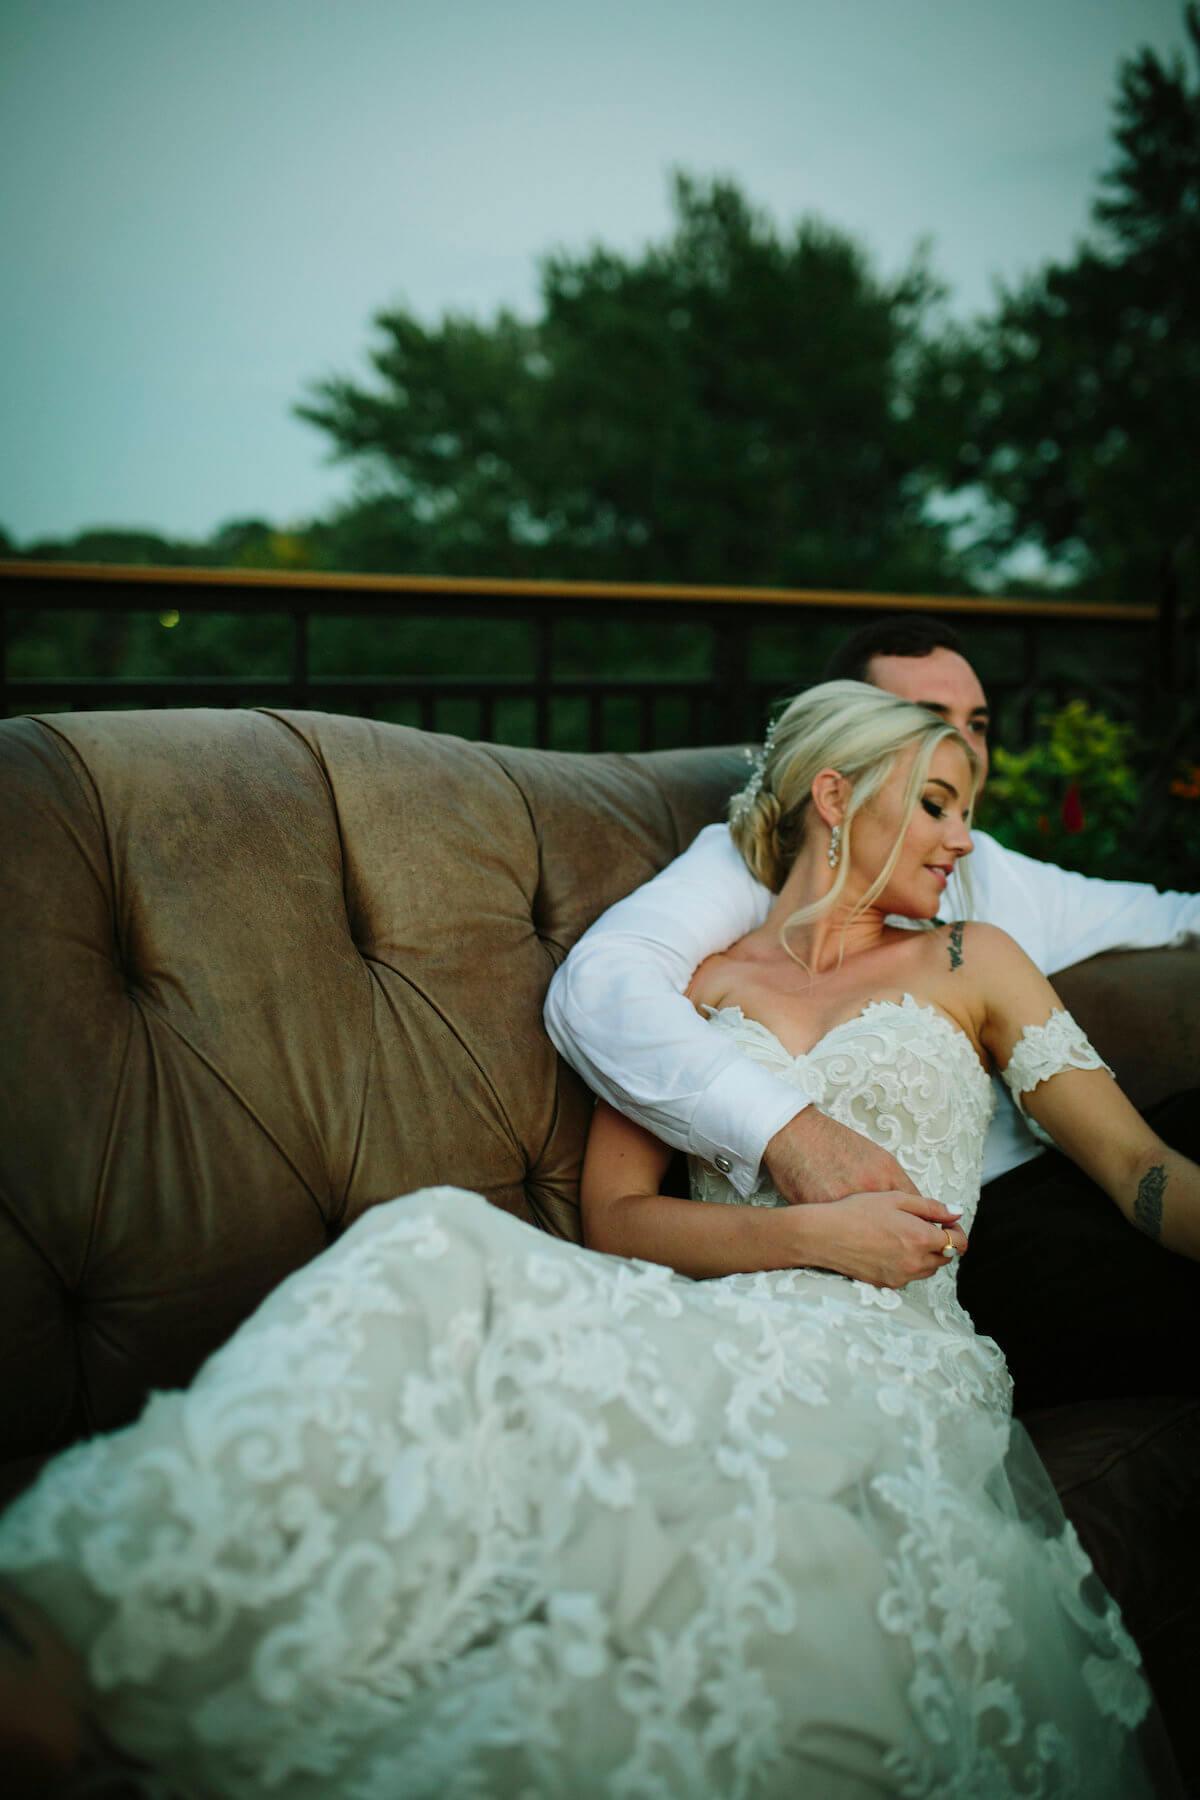 engle-olson-april-cj-wedding-jessica-holleque-19.jpg